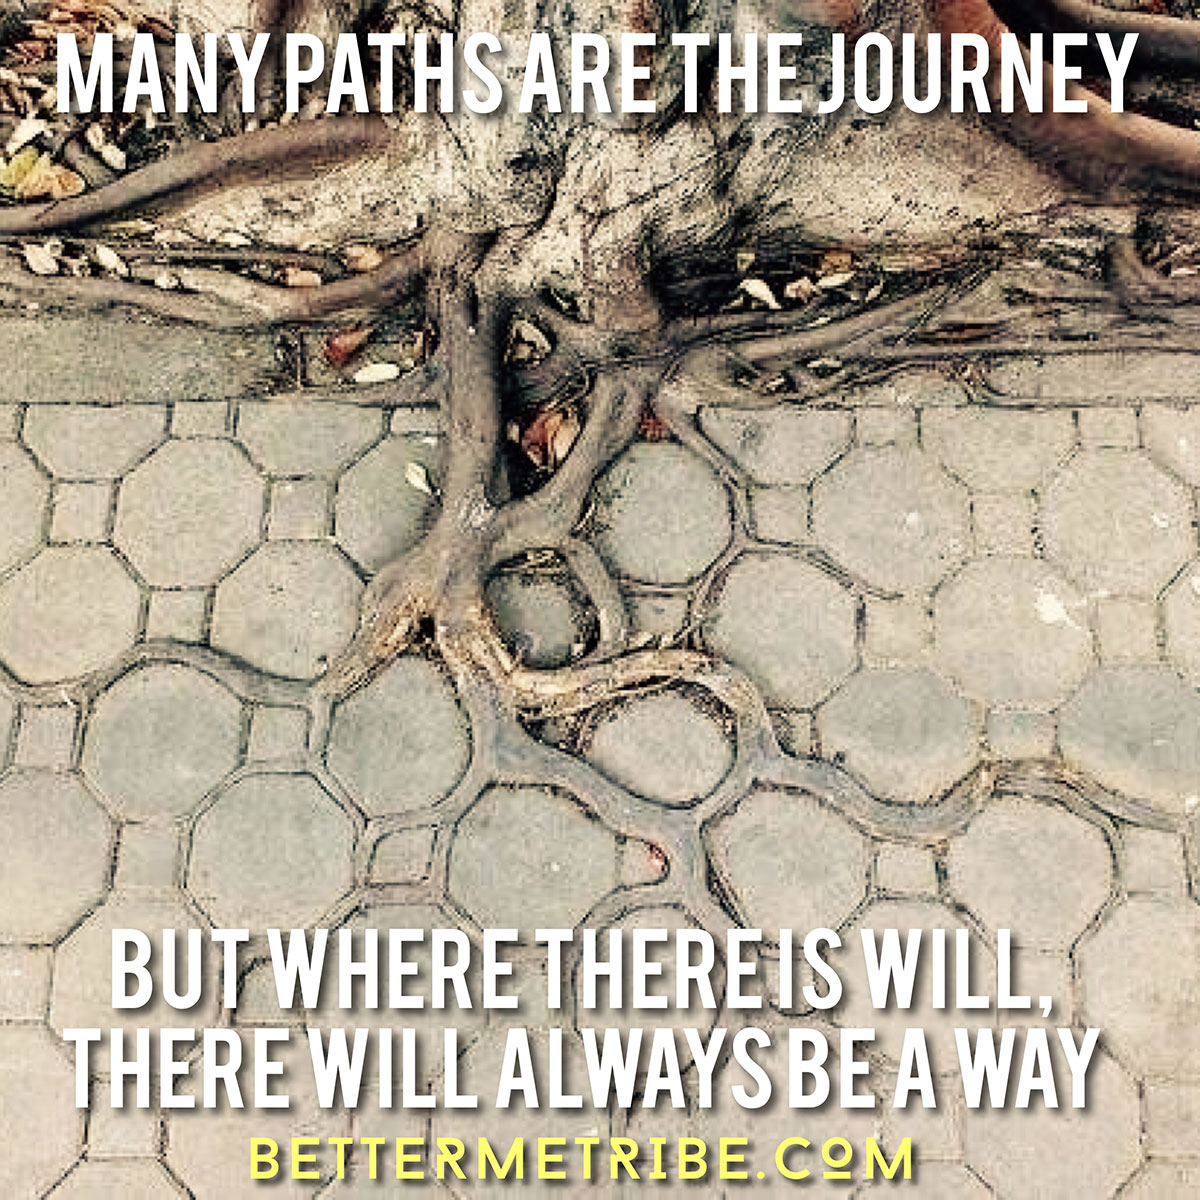 ManyPaths-Will-Web